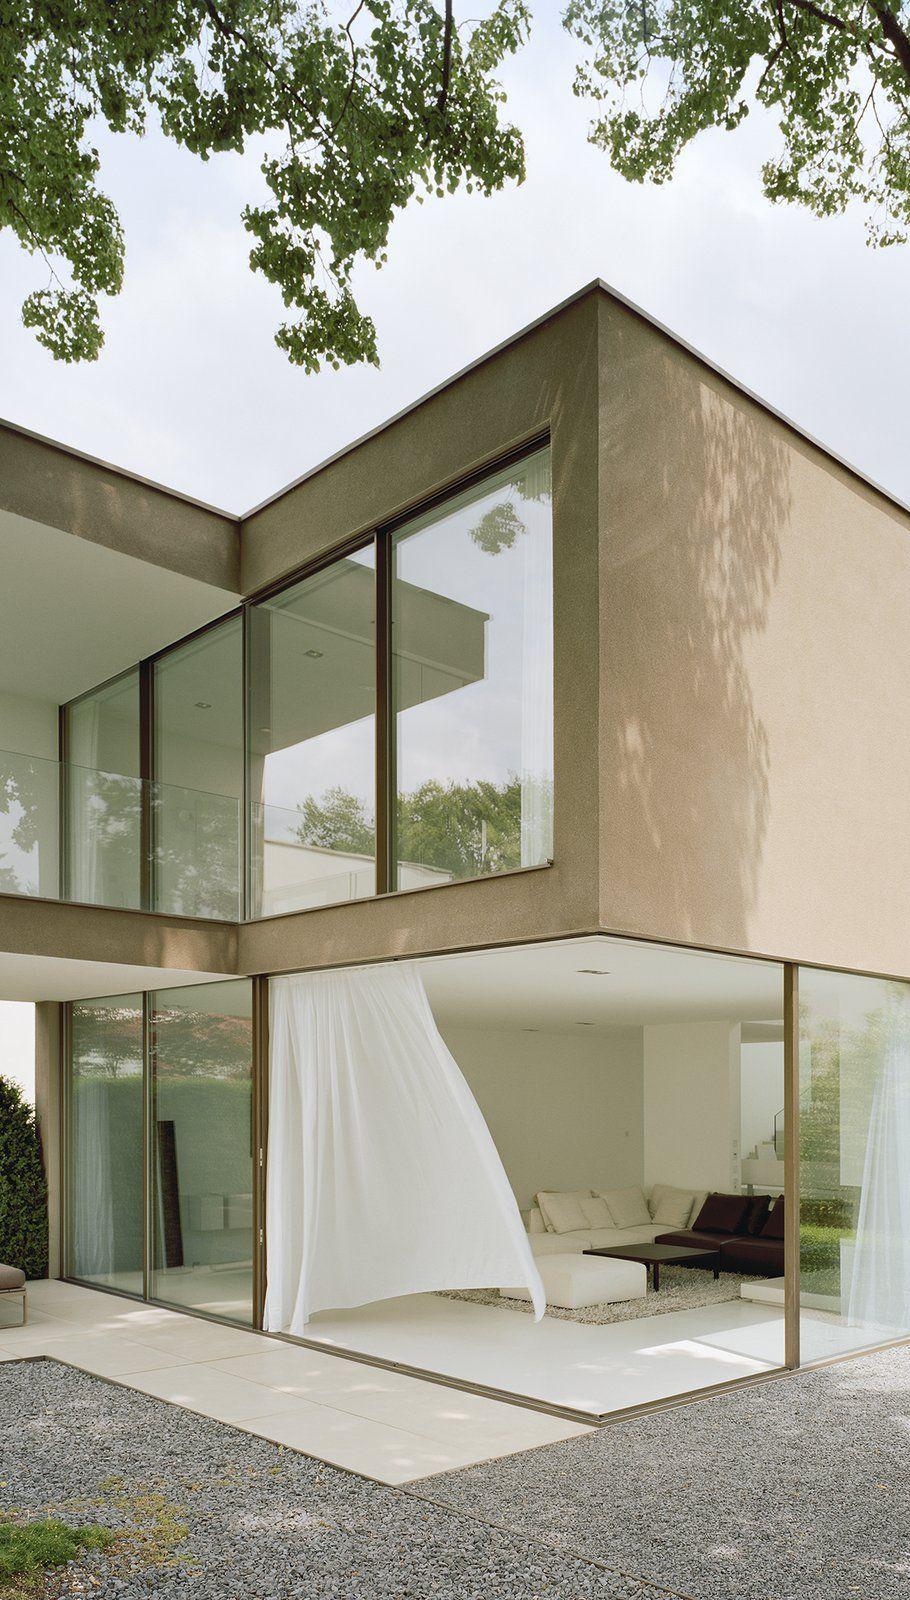 Sky-Frame Classic Schiebefenster | Fenster | Pinterest | Fassaden ...